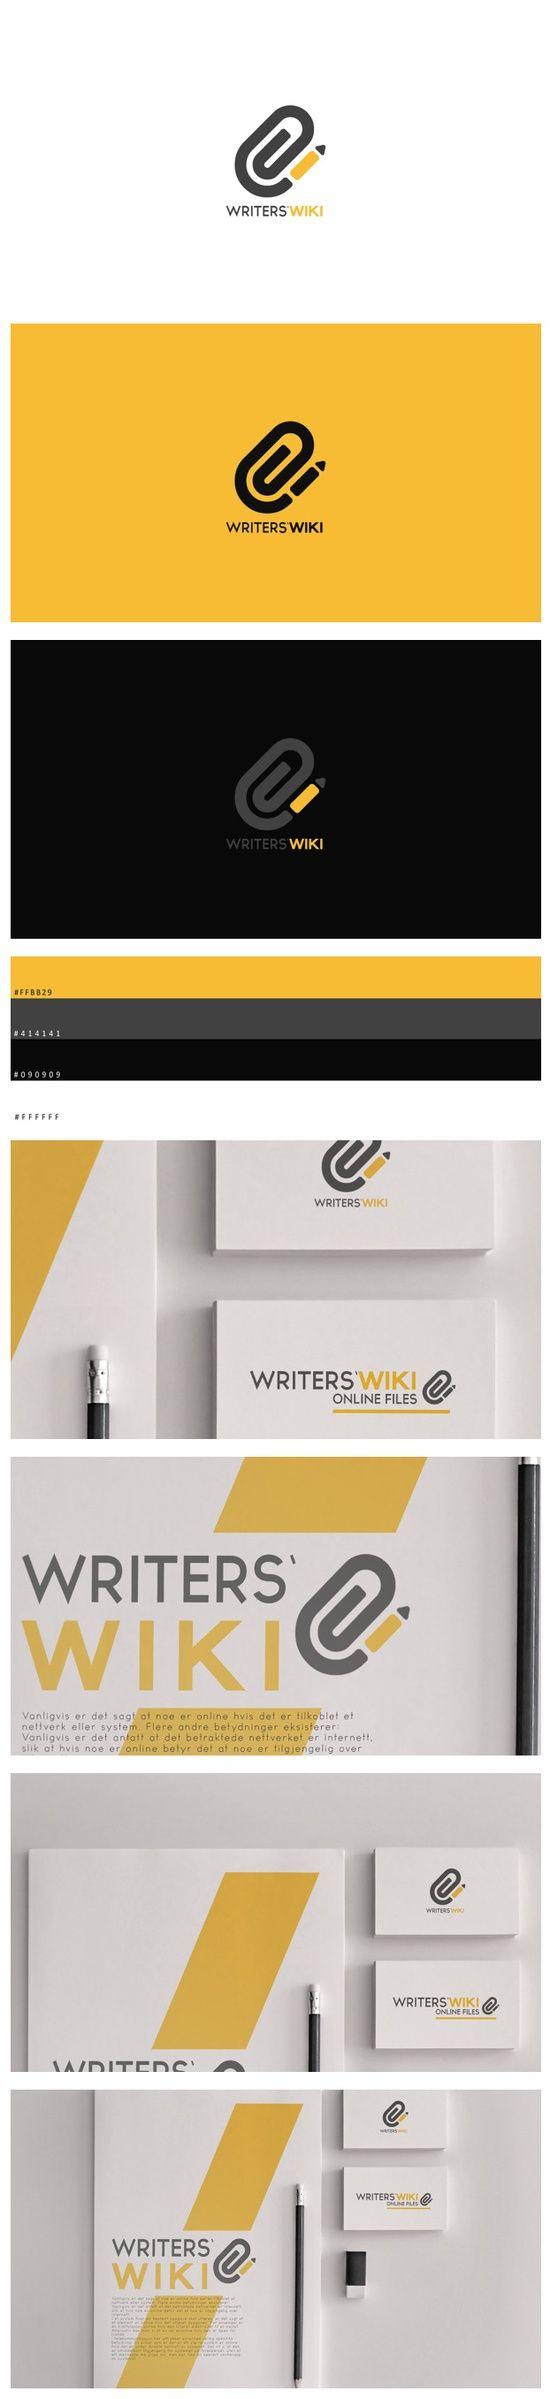 Writers' Wiki by Jørgen Grotdal, via Behance